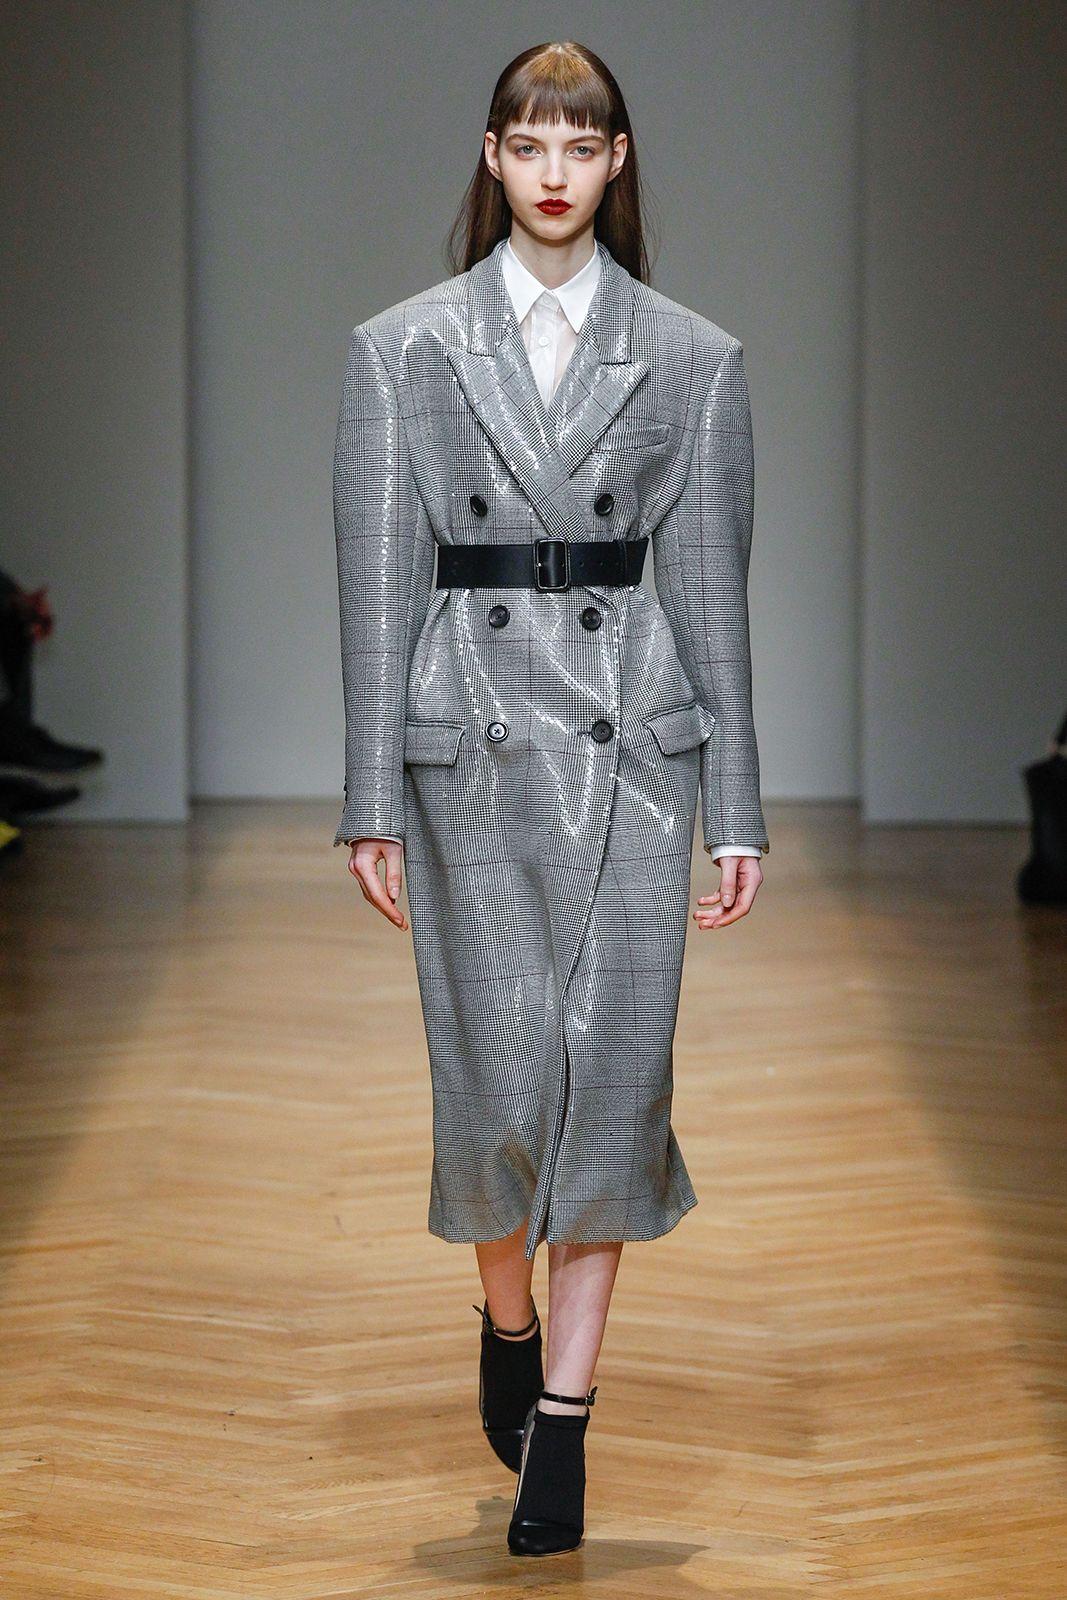 Shining  sequins coat for AquilanoRimondi FallWinter 2017-18 collection.